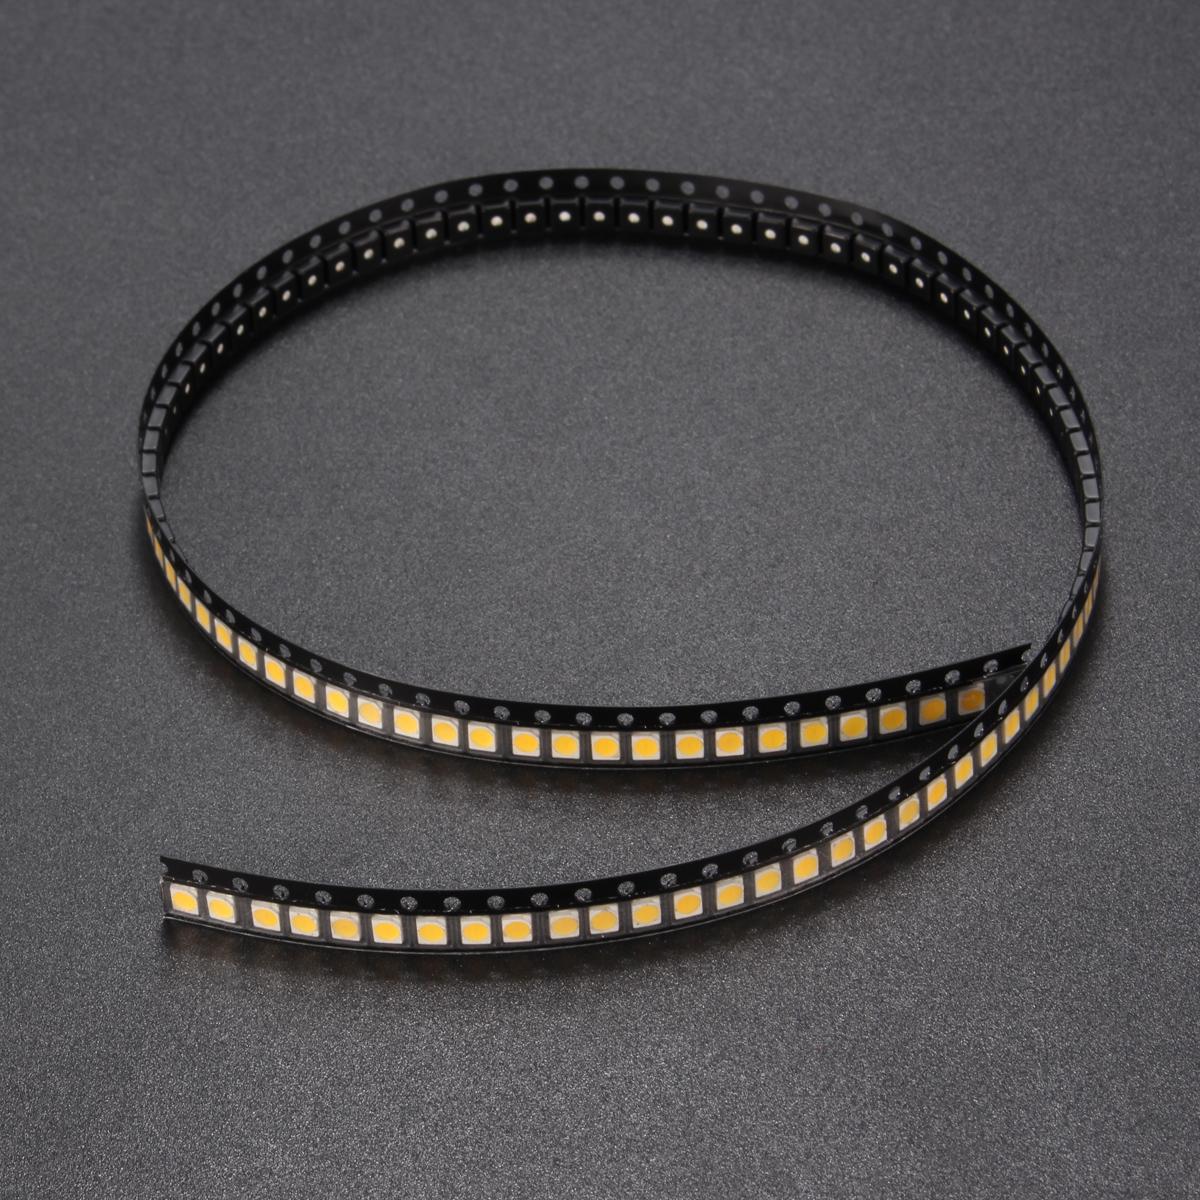 100PCS SMD3528 1210 1W 100LM Warm White LED Backlight DIY Chip Bead